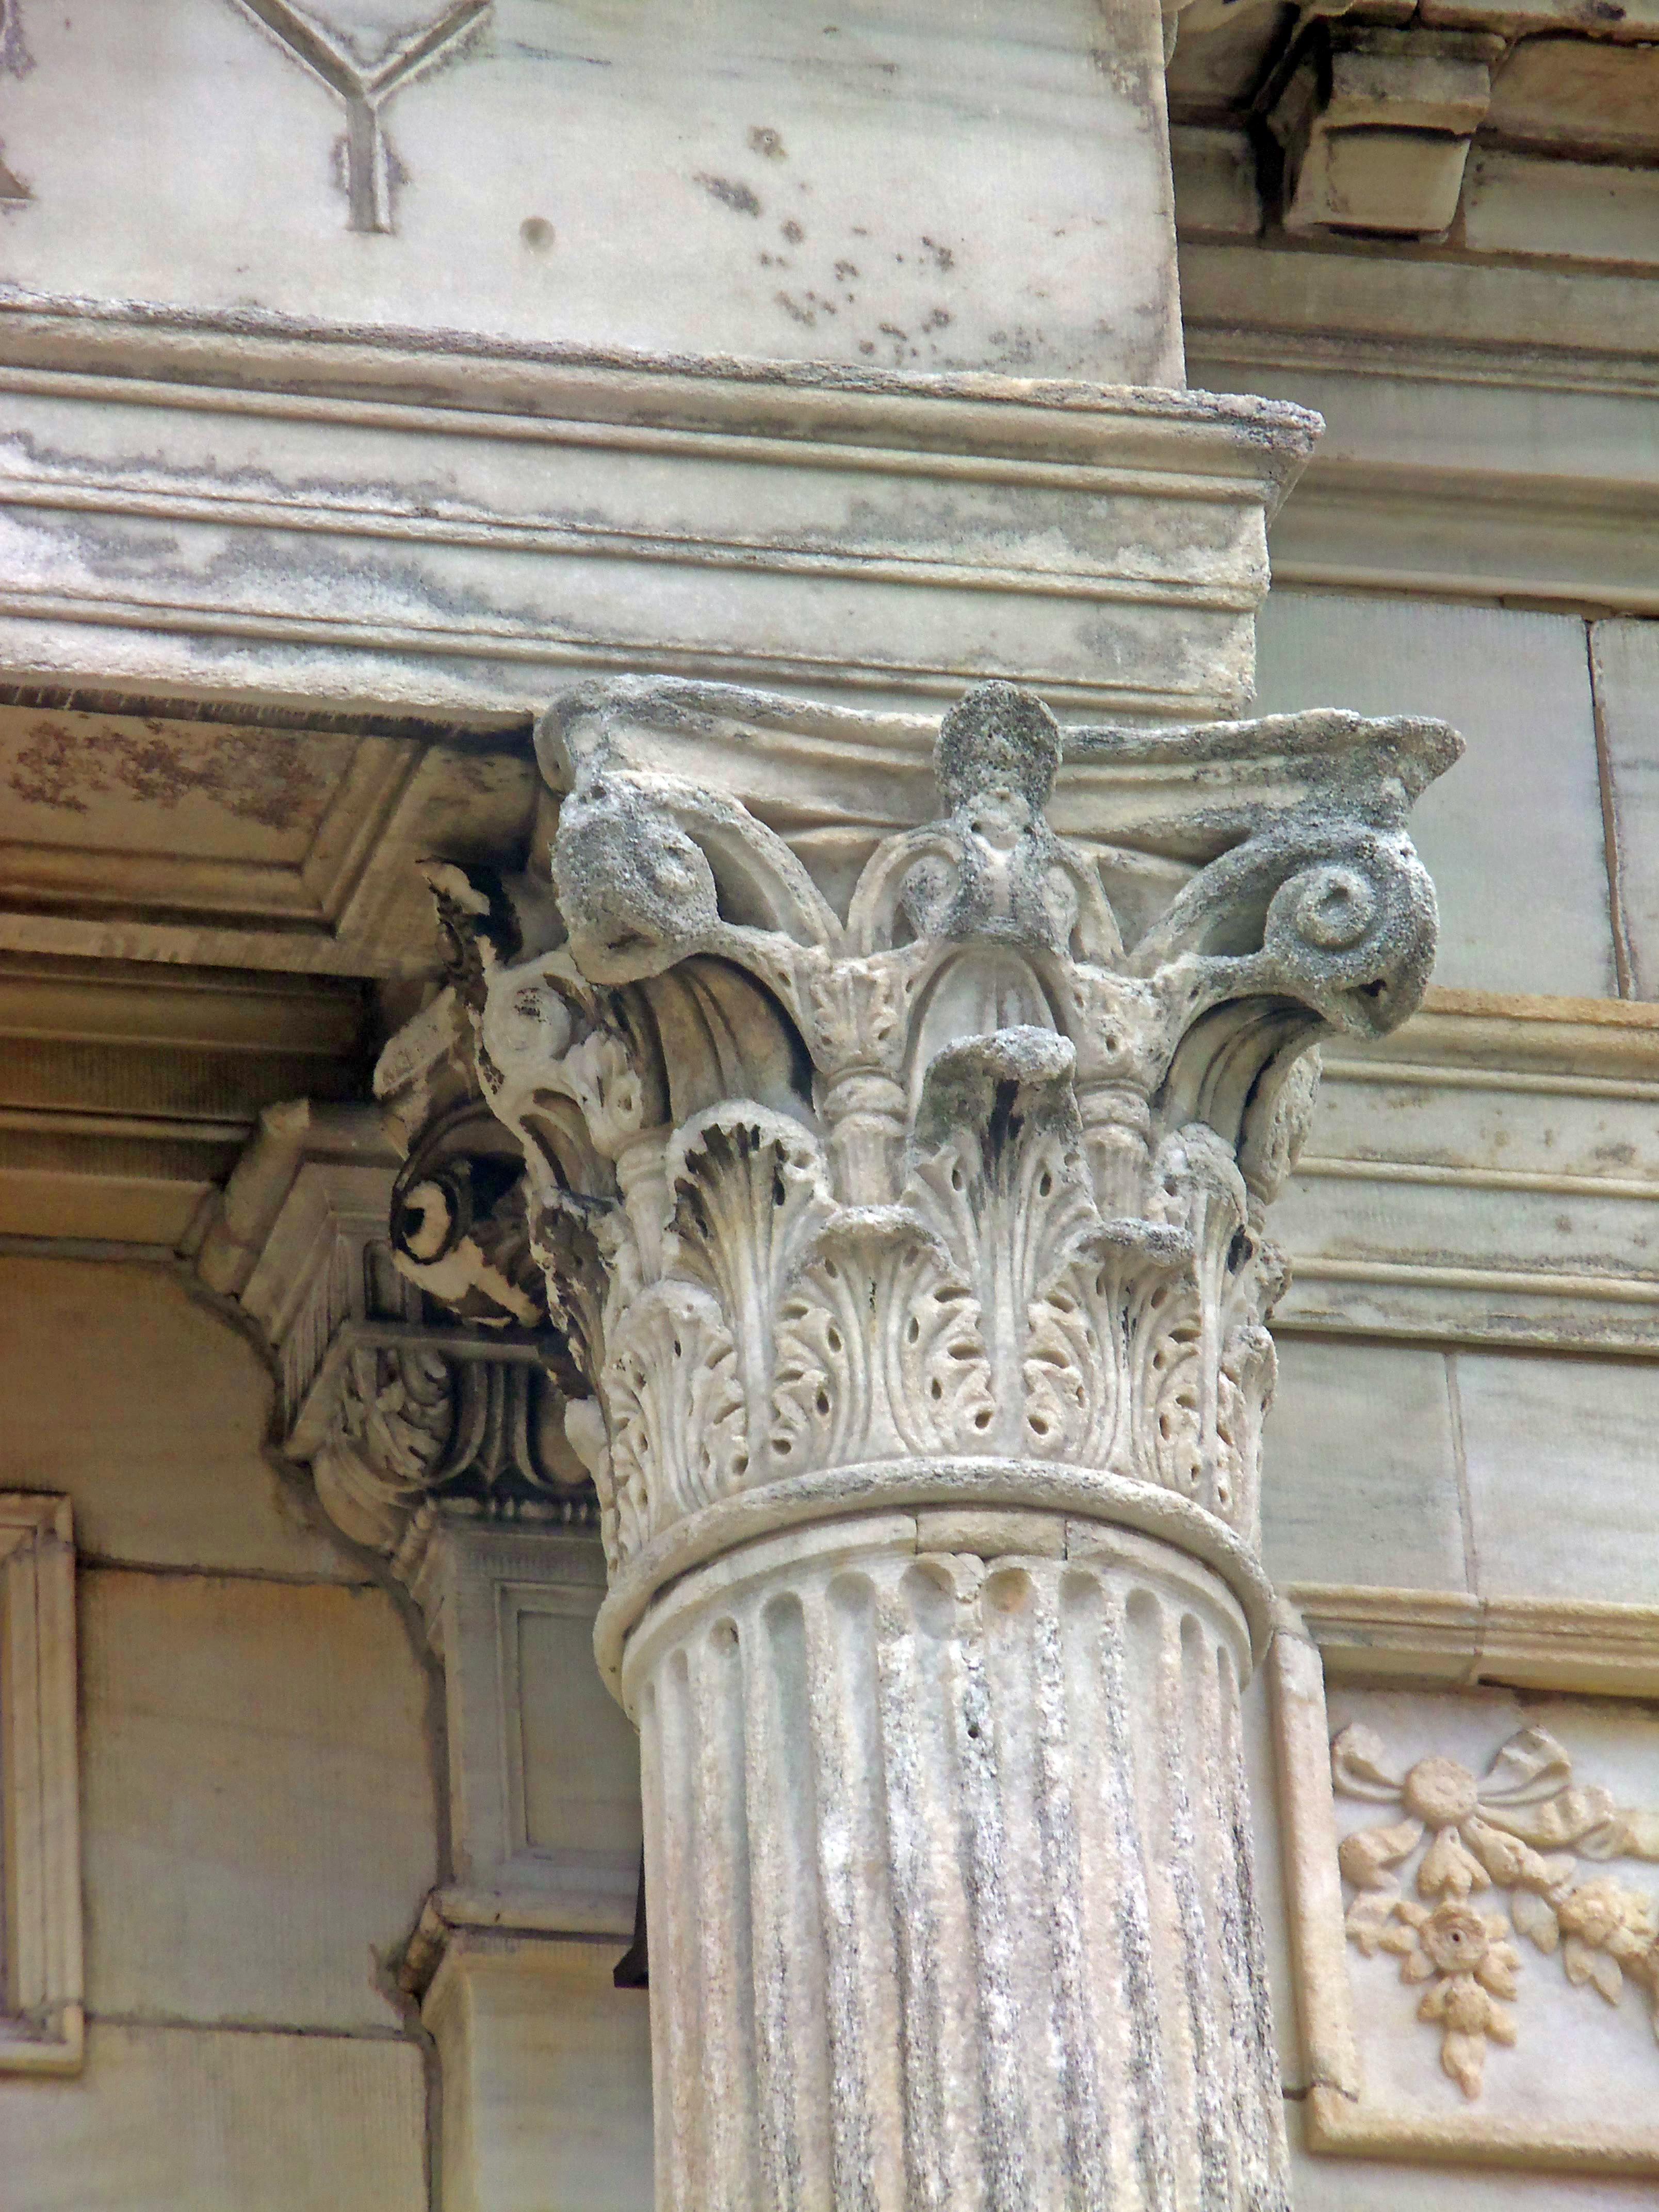 FileAdriance Memorial Library Column Capital Detailjpg